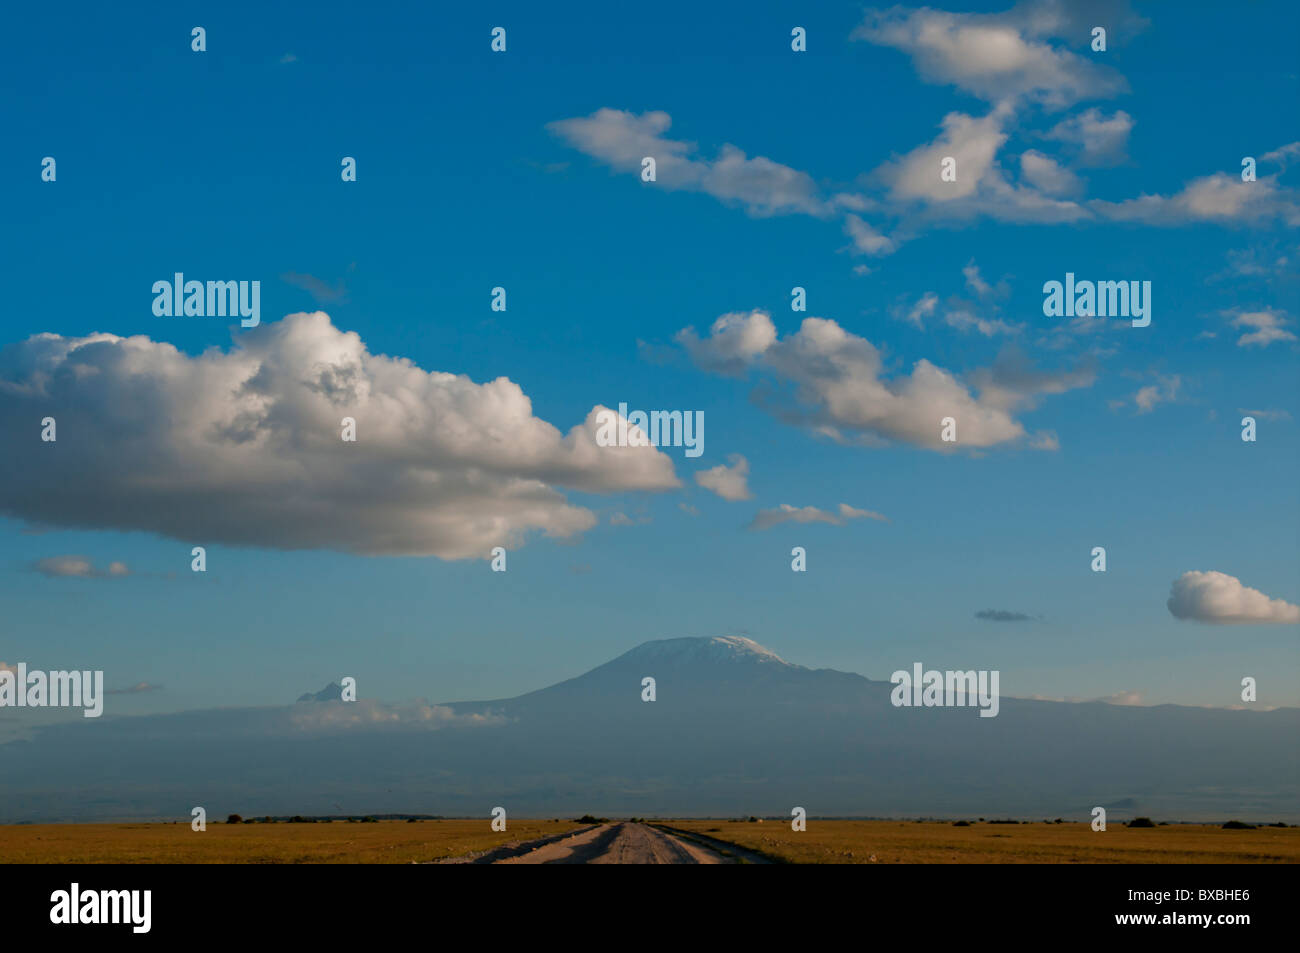 Kenya, Amboseli, Kilimanjaro, view landscape - Stock Image